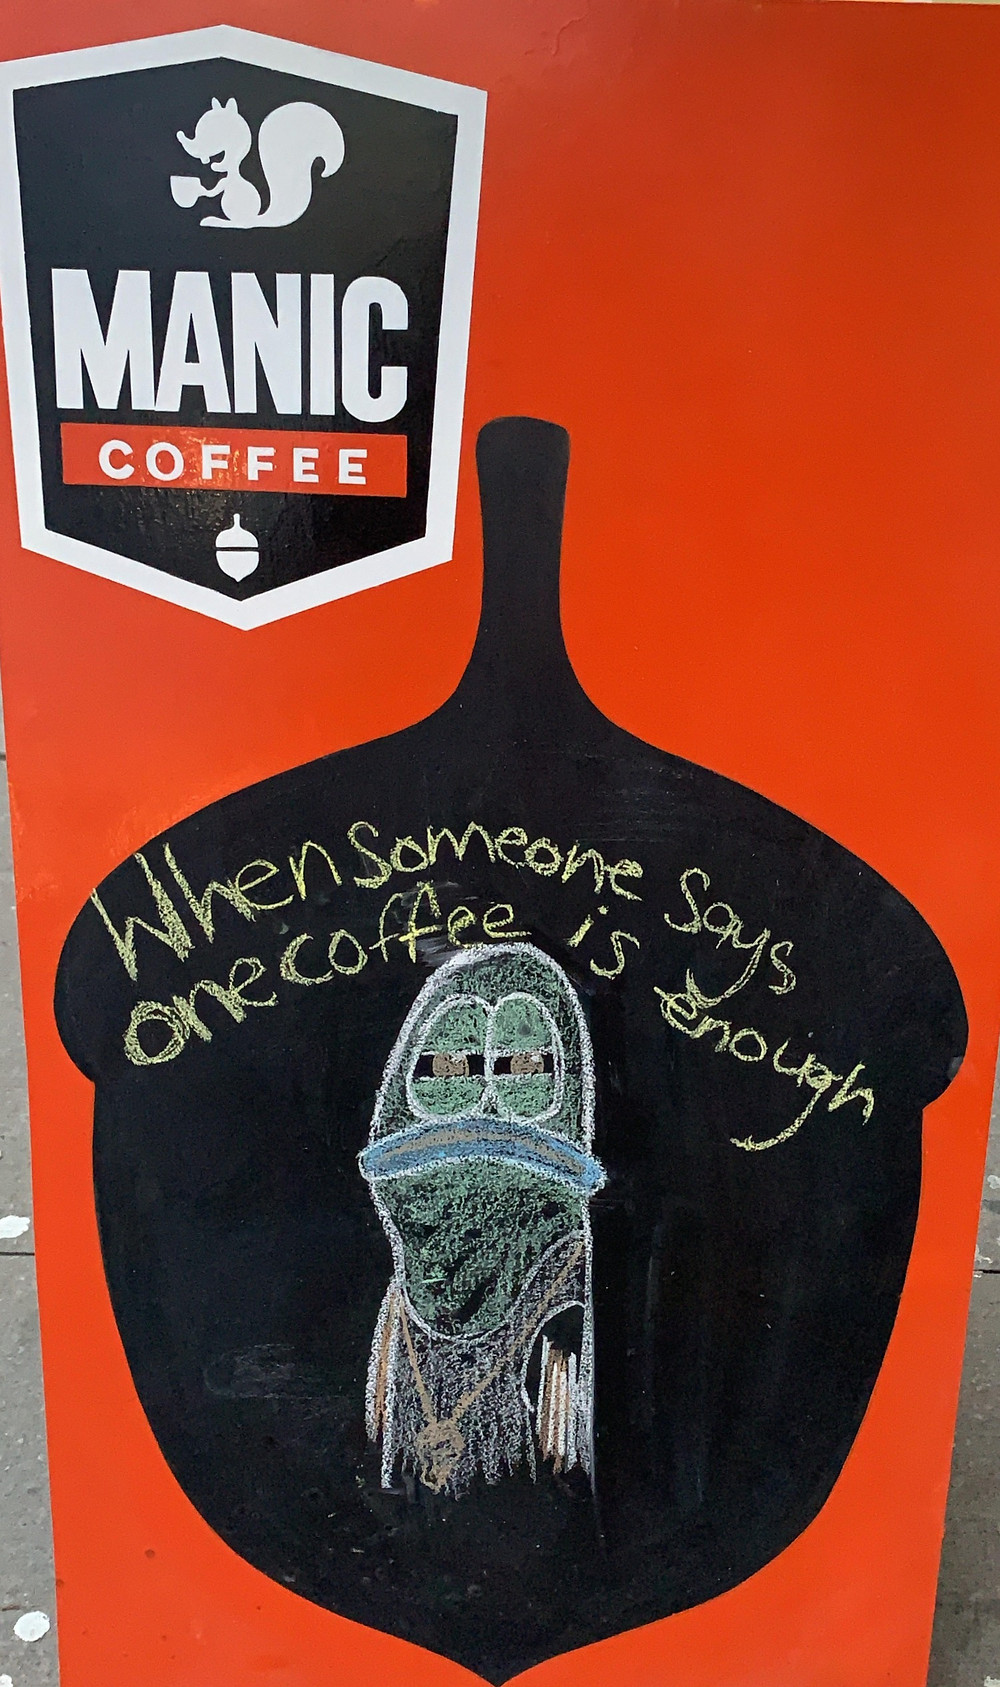 Manic Coffee signboard, Spongebob reference